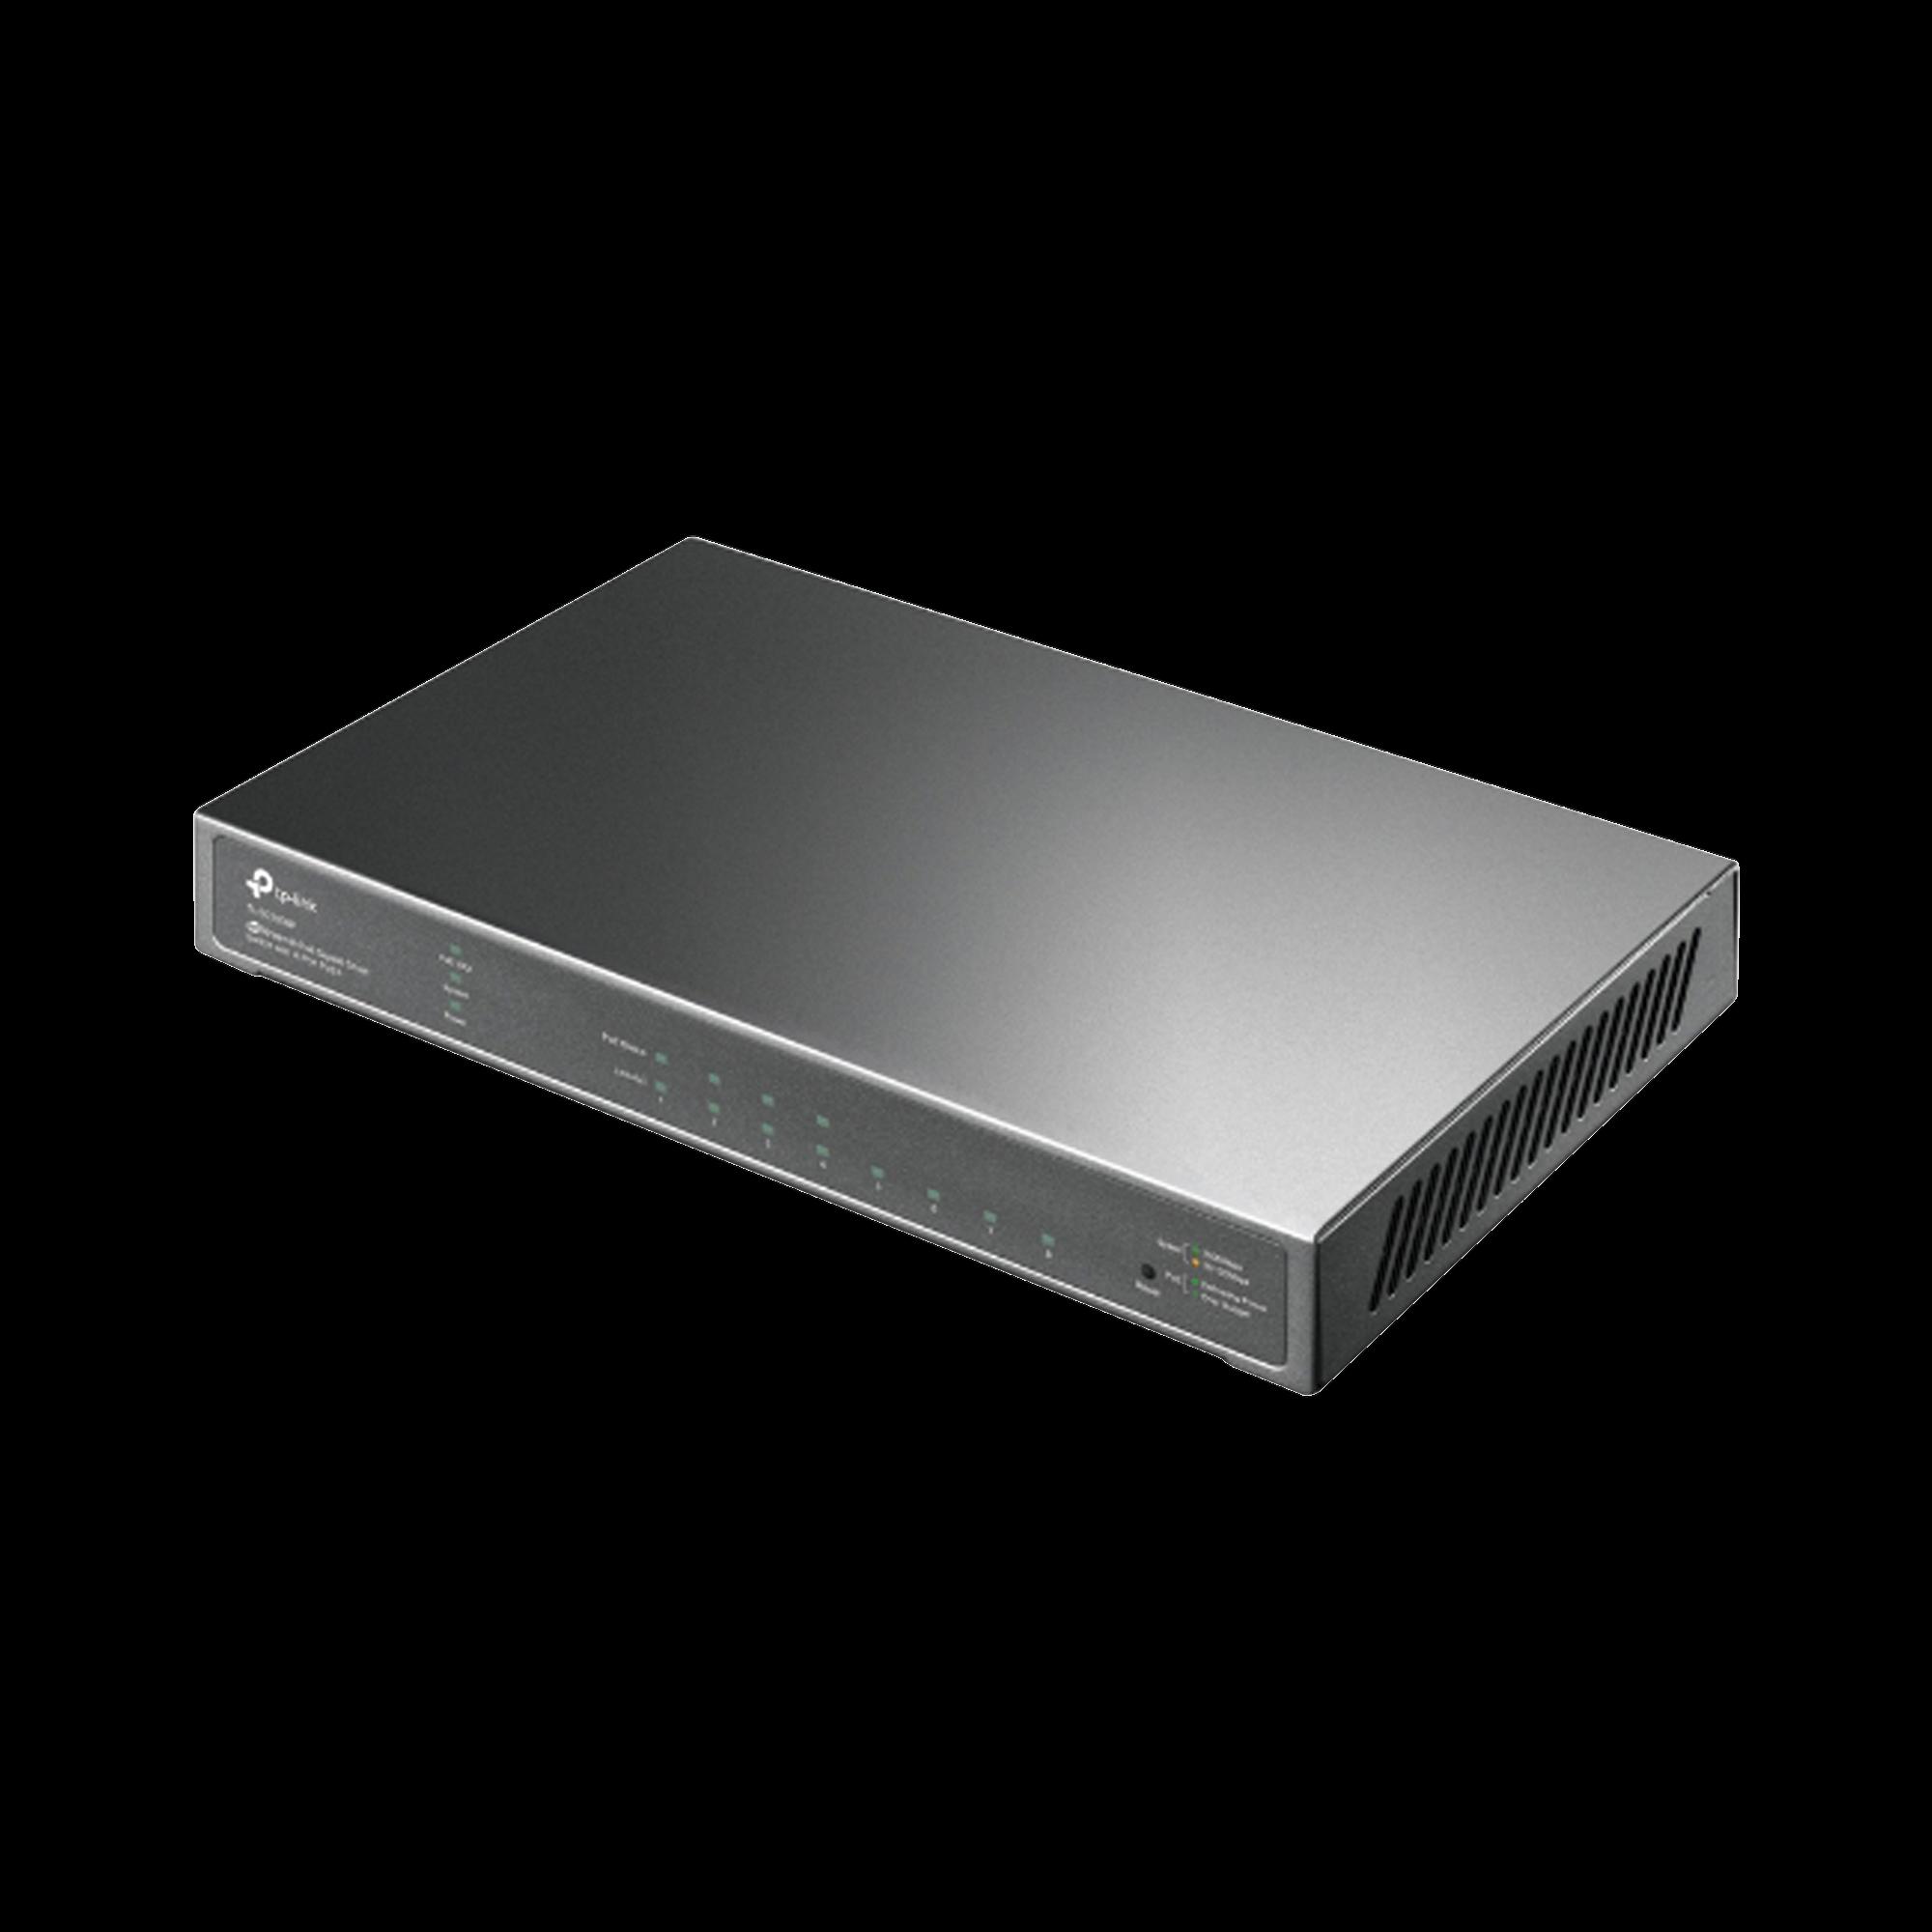 Switch PoE JetStream SDN Administrable 8 puertos 10/100/1000 Mbps, 4 puertos PoE, 62W, administración centralizada OMADA SDN